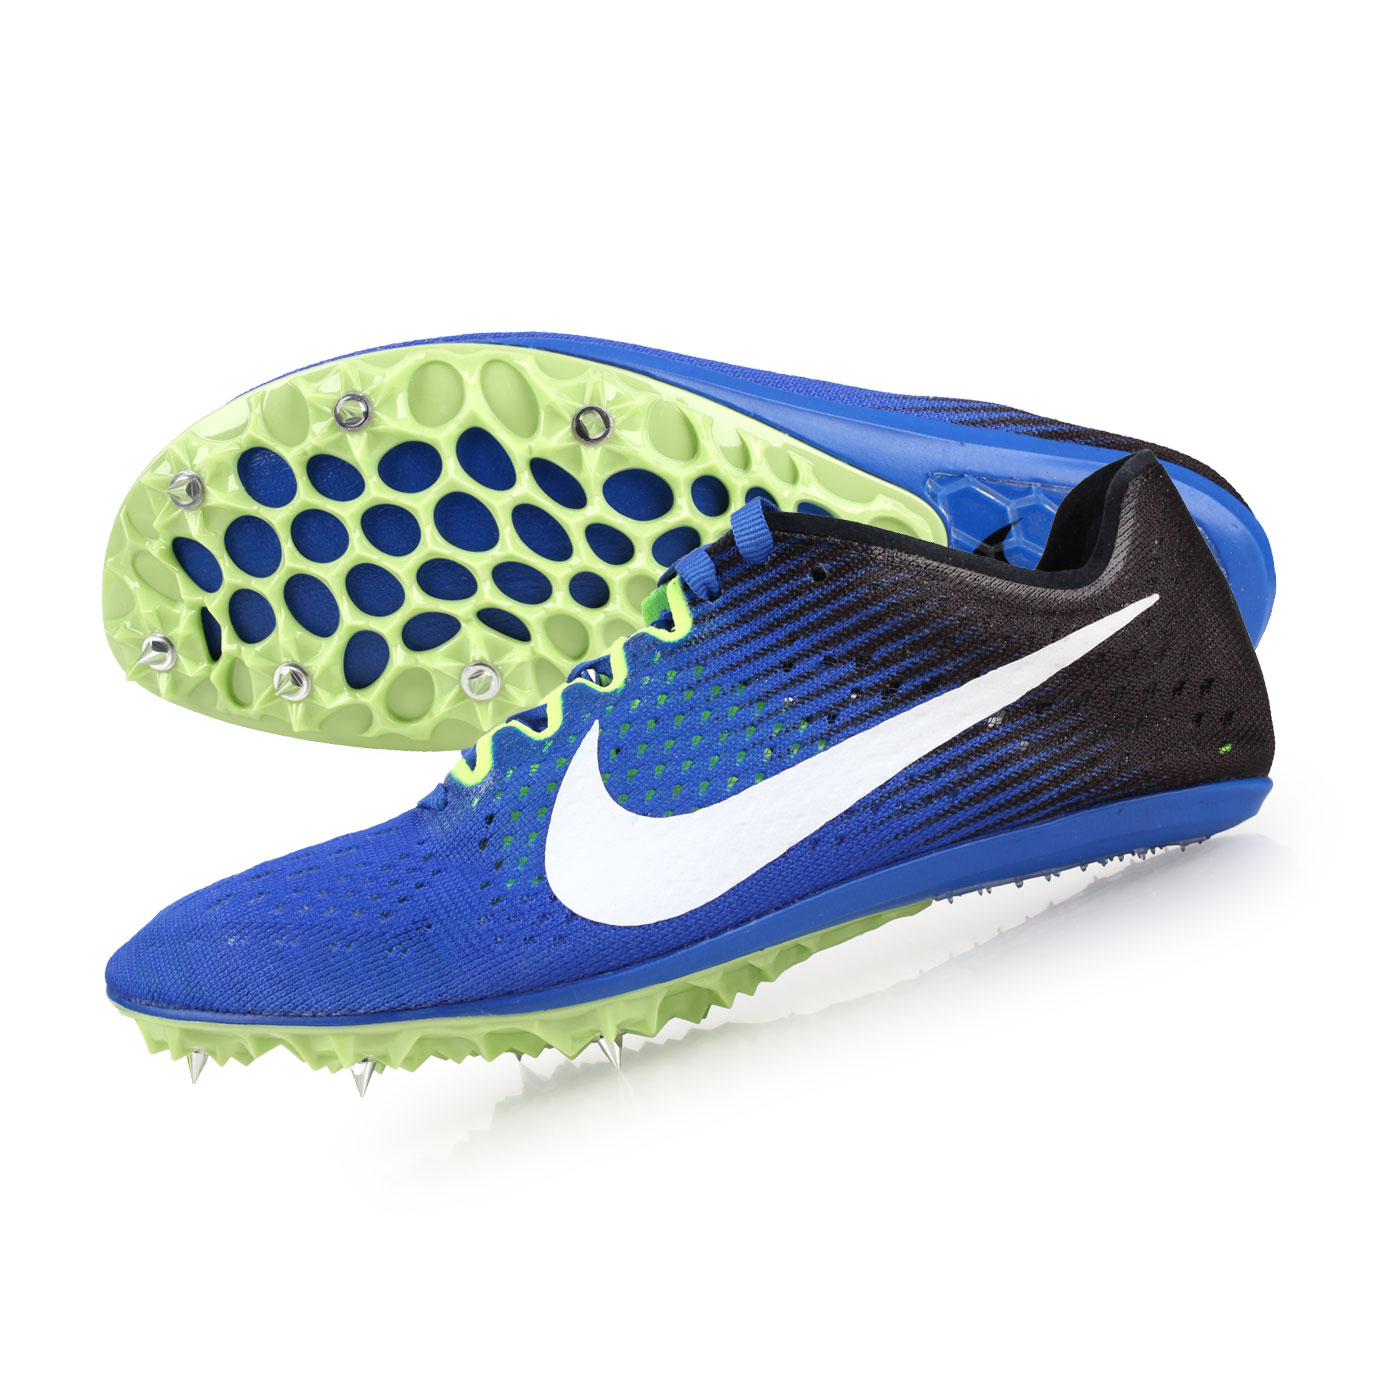 NIKE 田徑釘鞋(中長距離)  @ZOOM VICTORY 3@835997411 - 藍黑